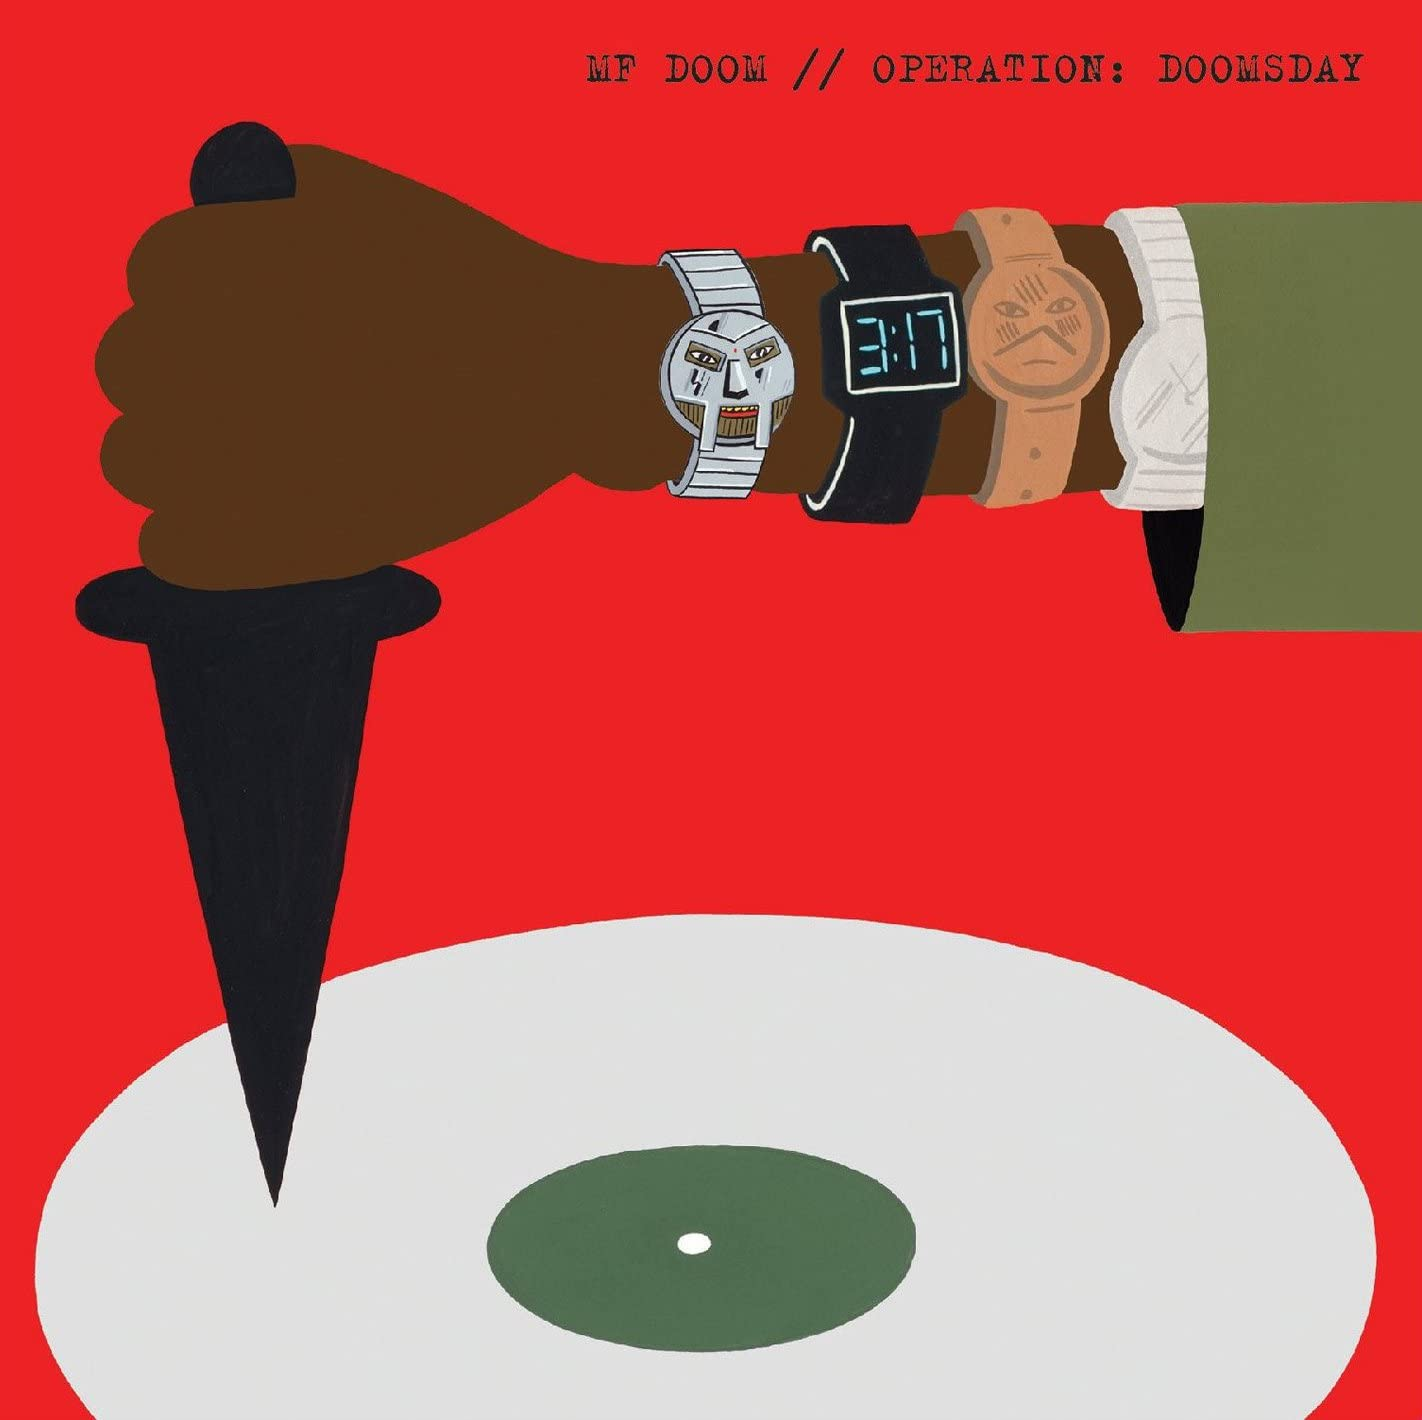 "MF Doom Operation Doomsday 2011 Edition Hip Hop Cover Poster 20×20 24×24 32×32/"""